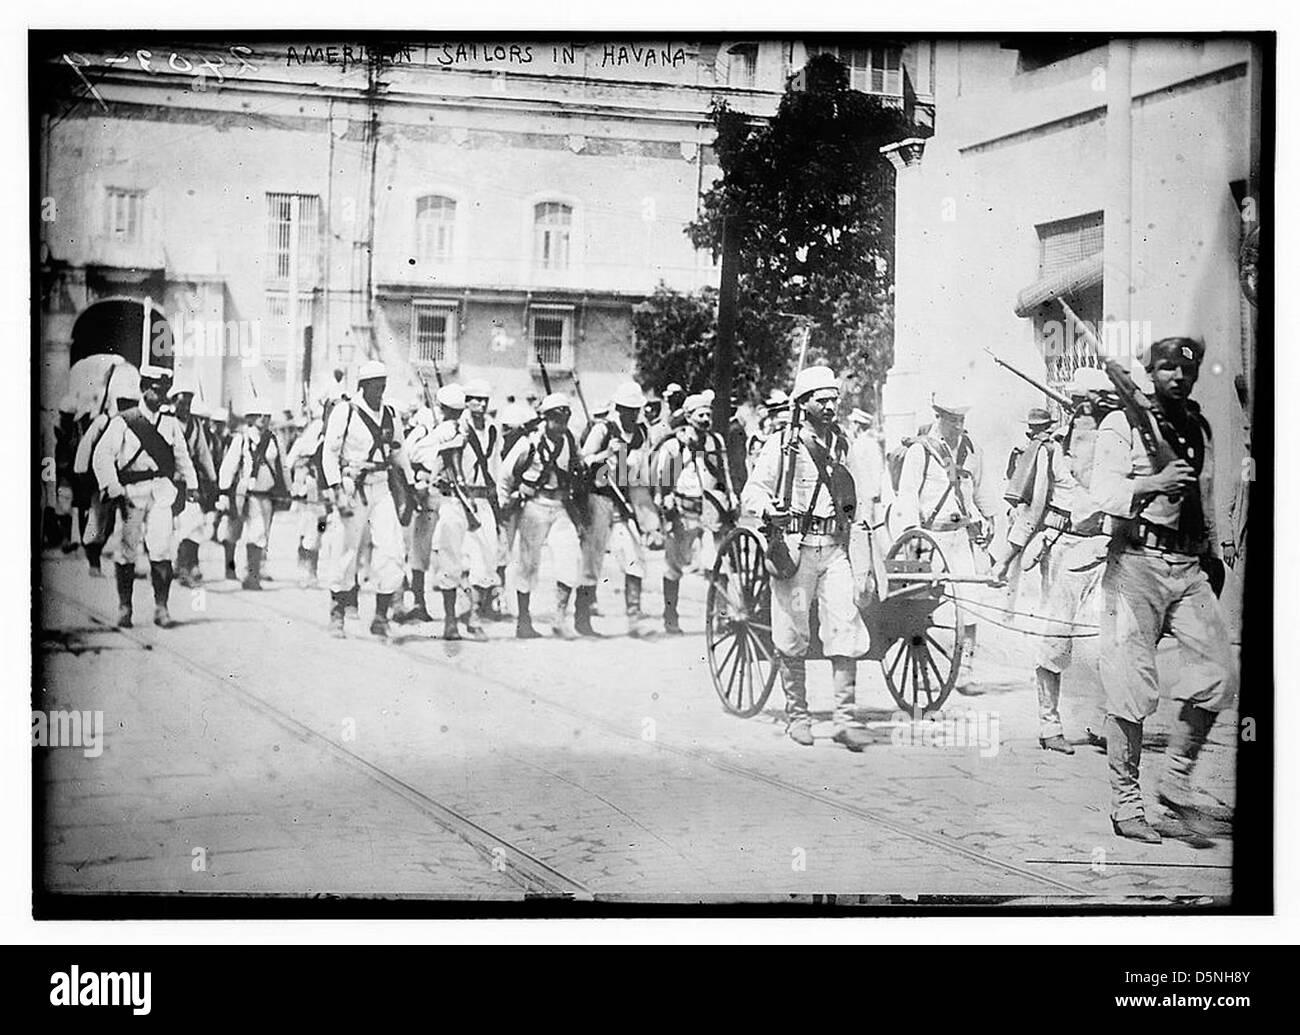 American Sailors in Havana (LOC) - Stock Image